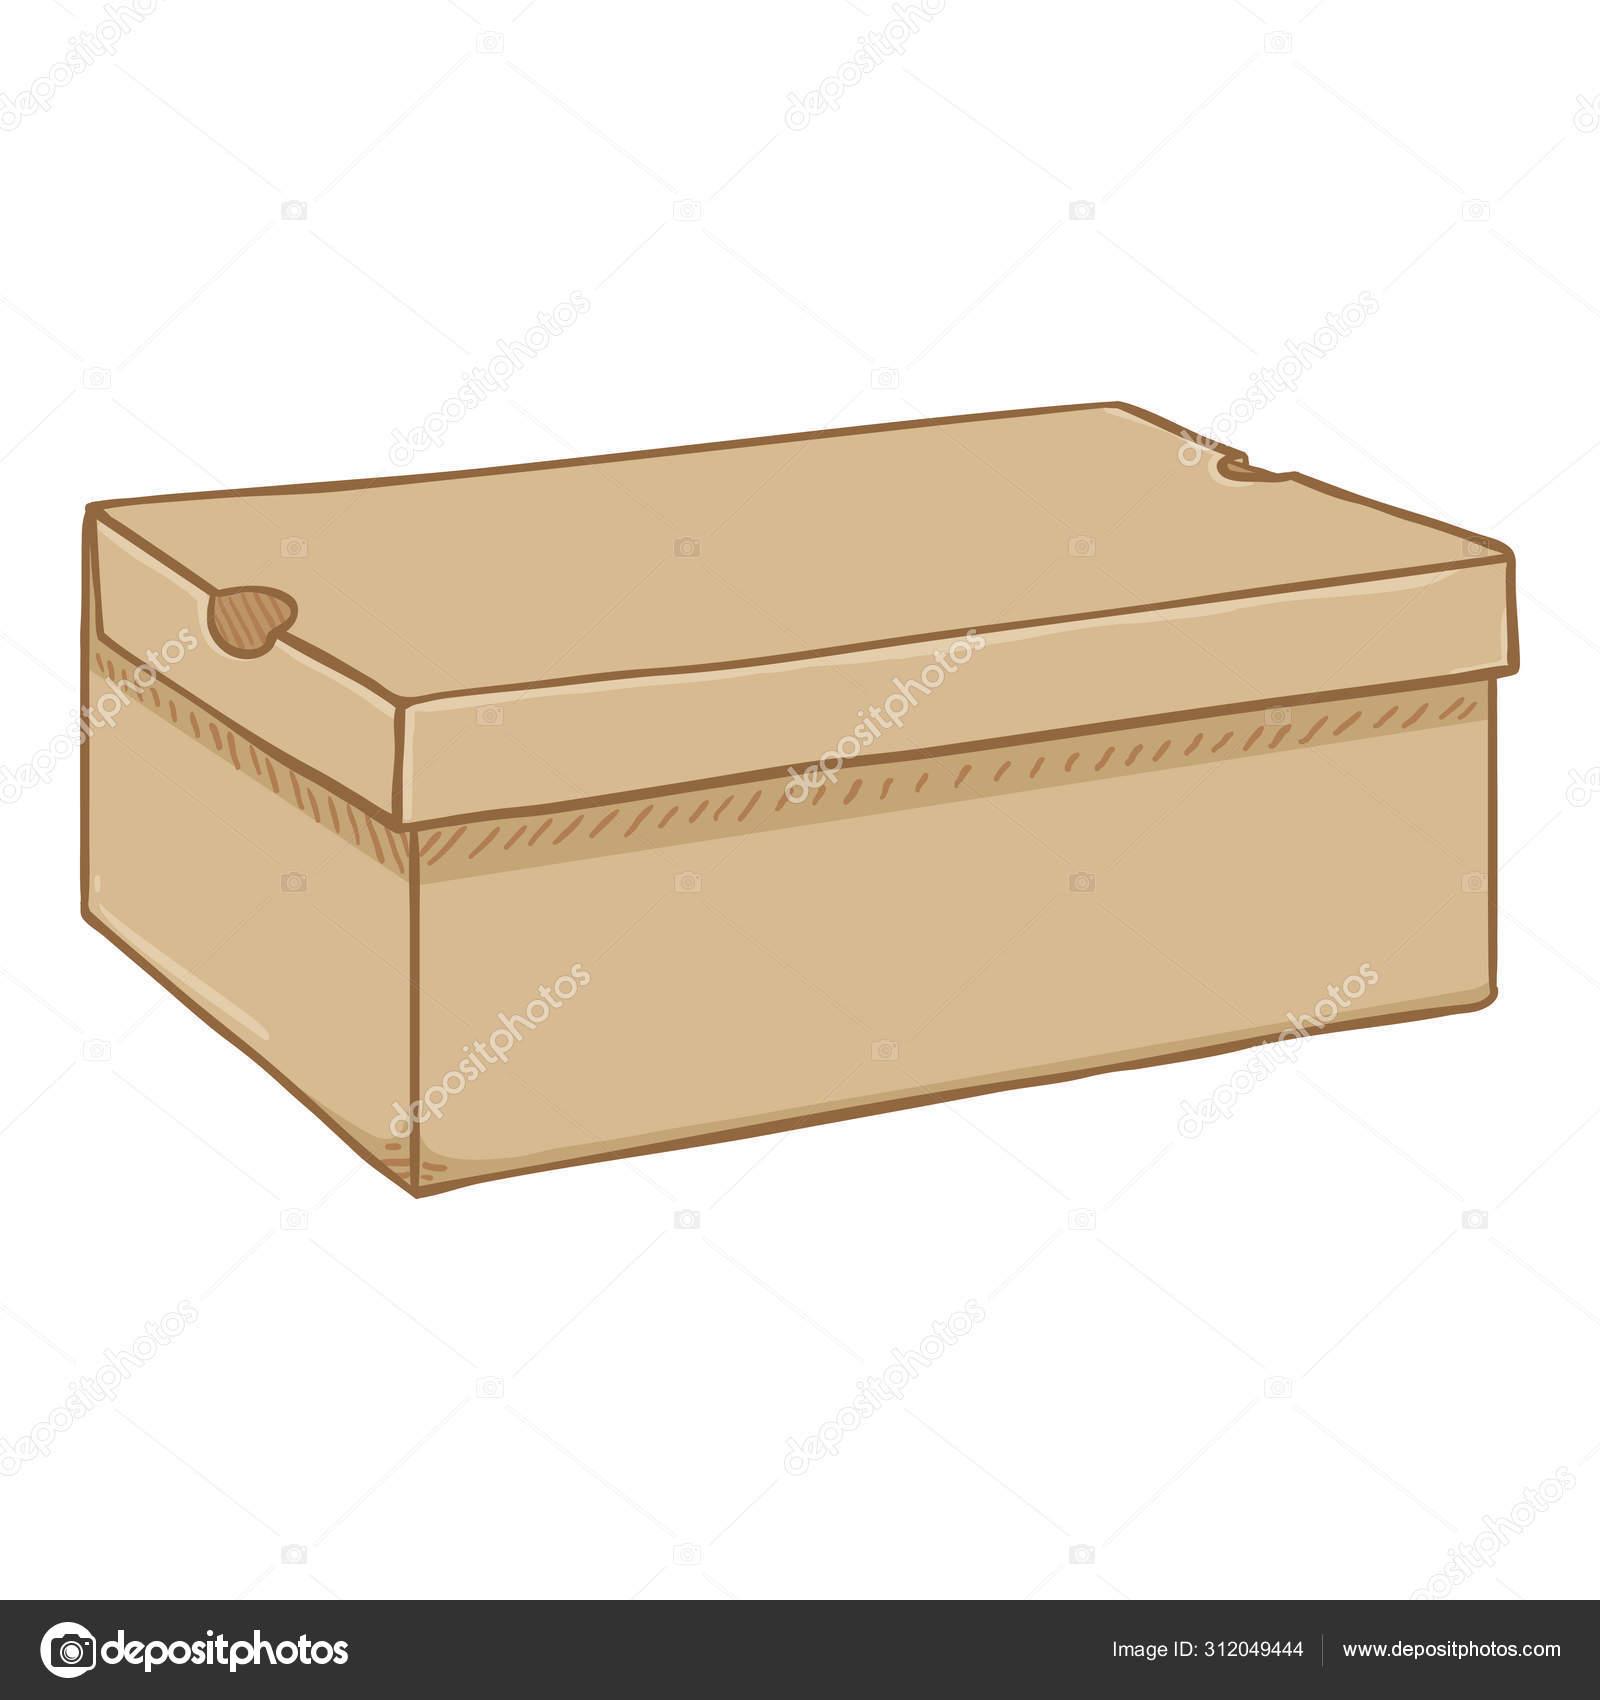 ᐈ Caja De Zapatos Vector De Stock Imágenes Zapatos De Caja Descargar En Depositphotos